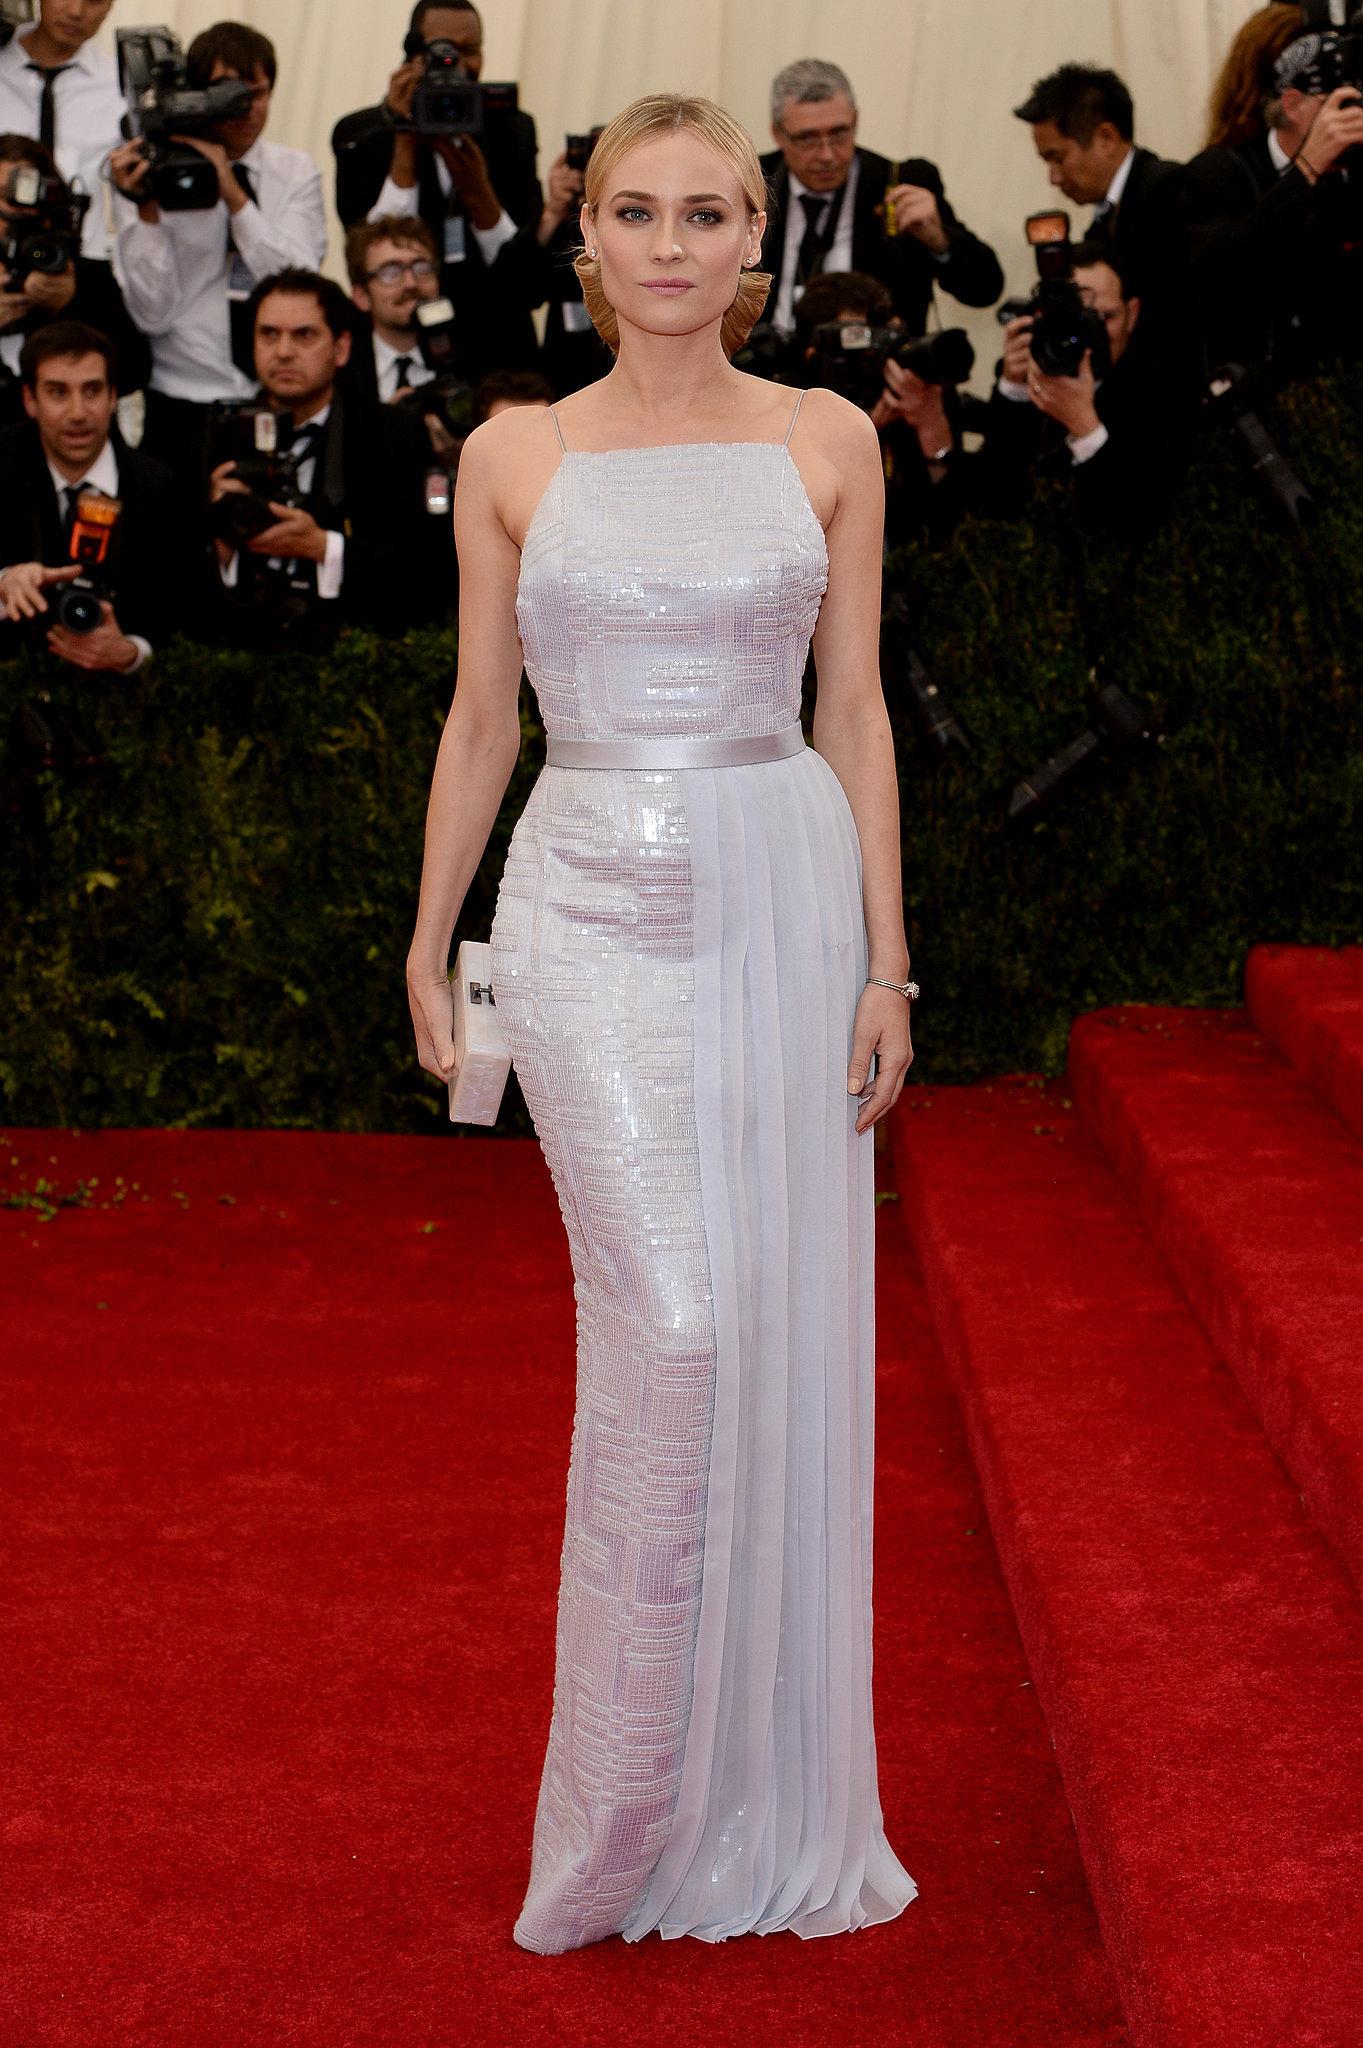 The Gorgeous Diane Kruger Hits a Met Gala Milestone